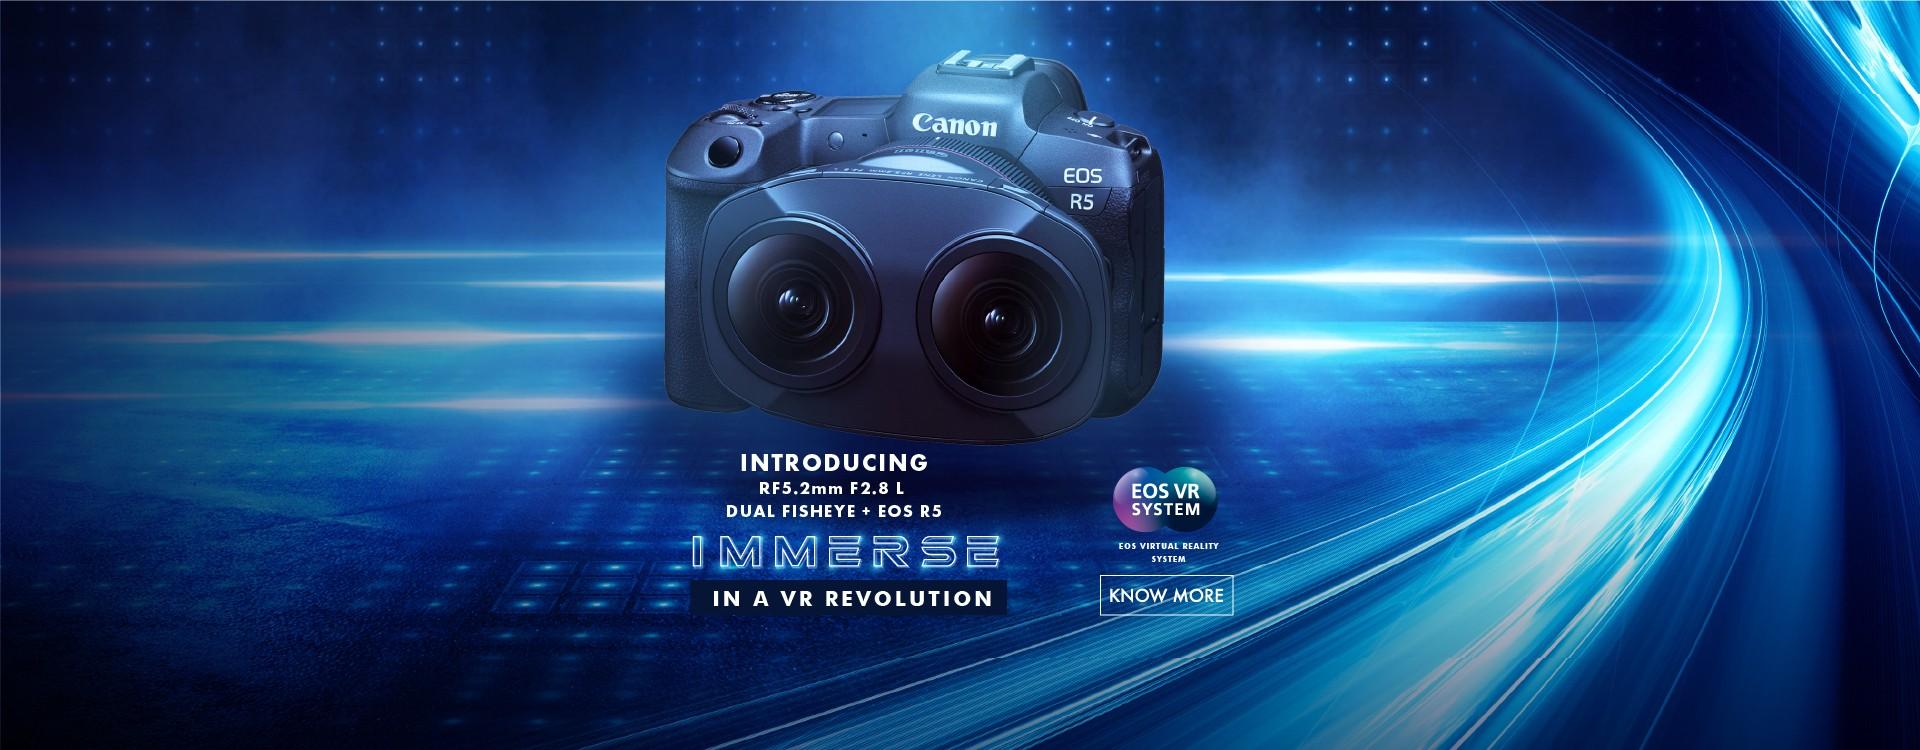 R5-Dual-Lens